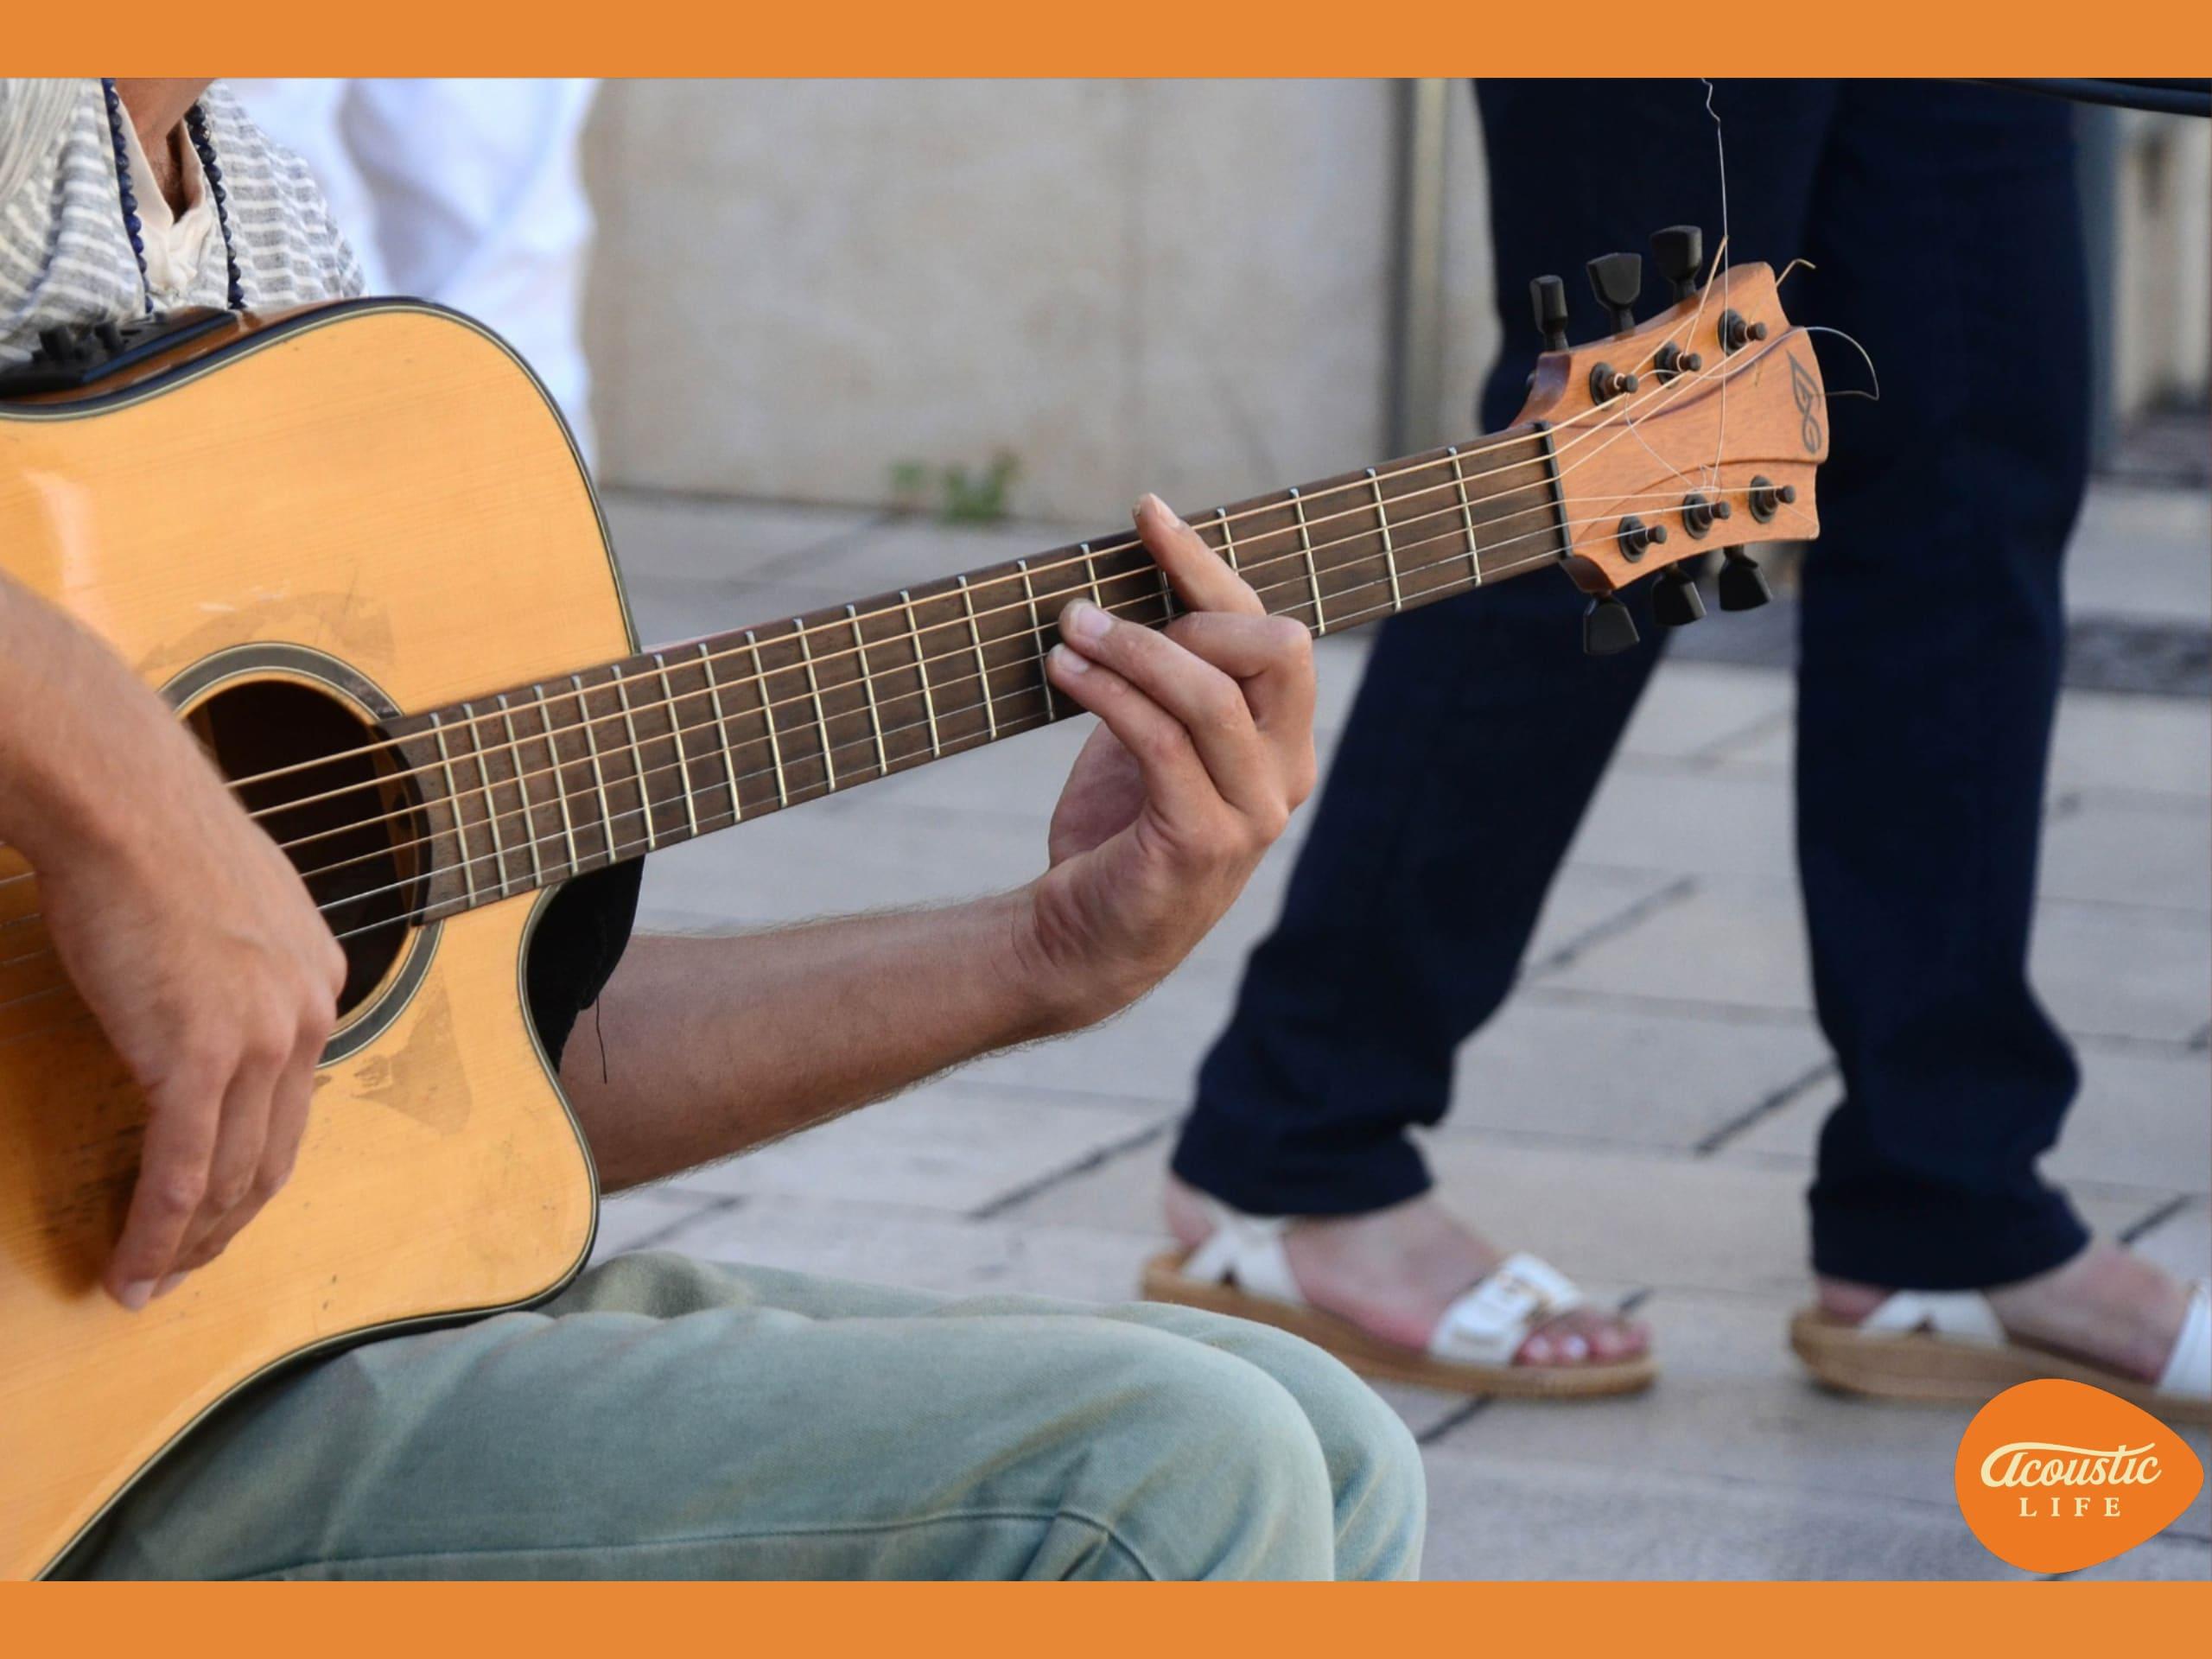 1 Vital Guitar Practice Reboot Tip and Why it Works